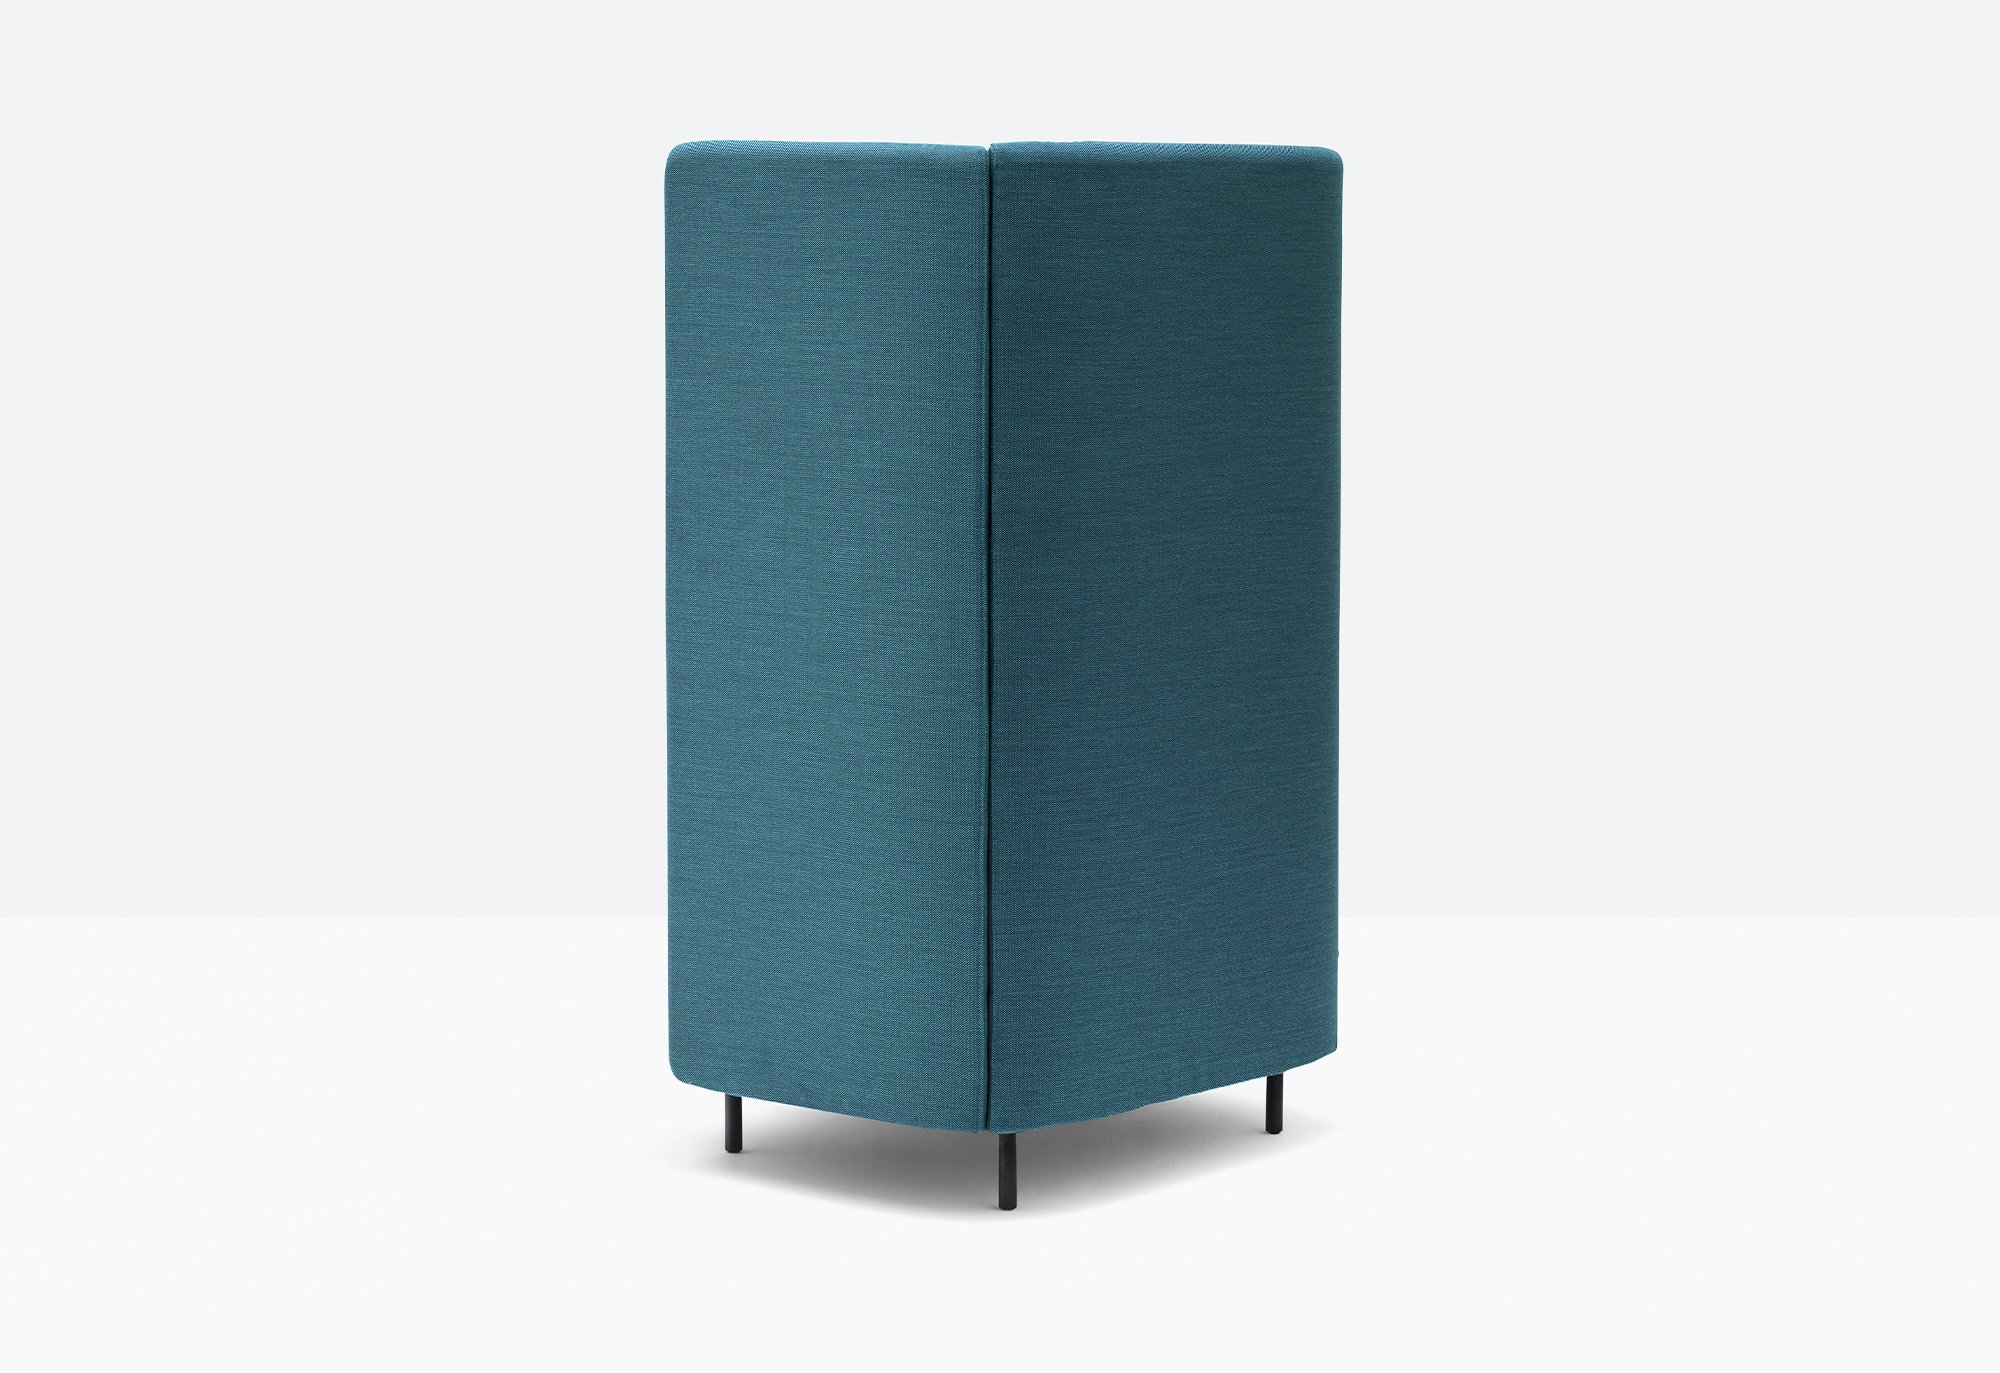 Buddyhub modular sofa from Pedrali, designed by Busetti Garuti Redaelli